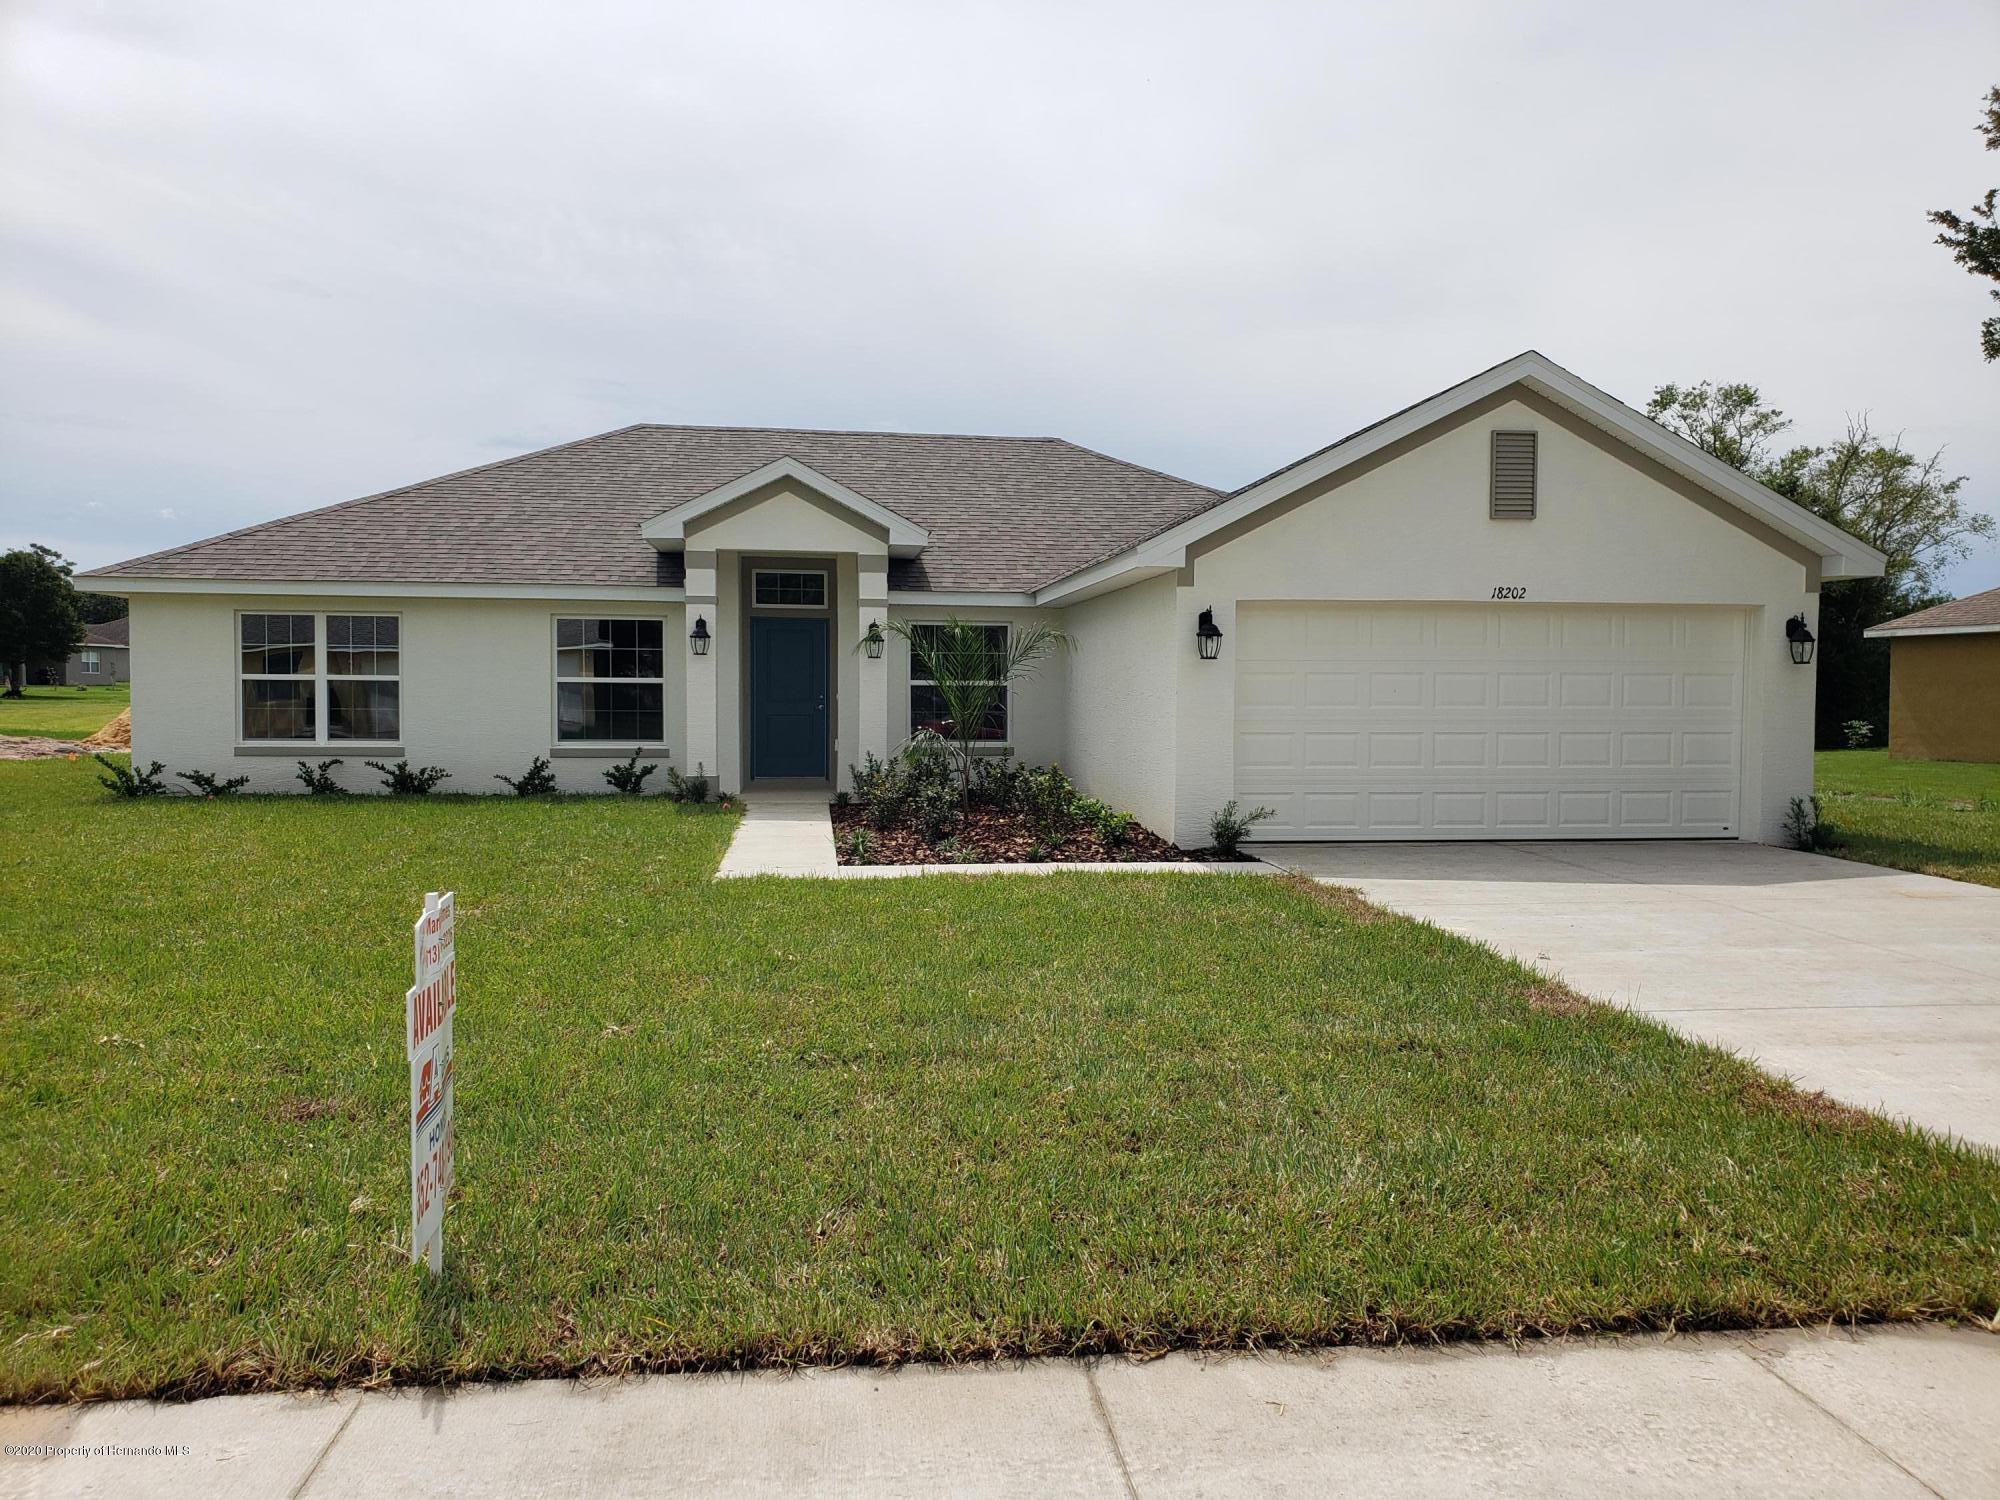 Listing Details for 18202 Rivard Boulevard, Brooksville, FL 34604